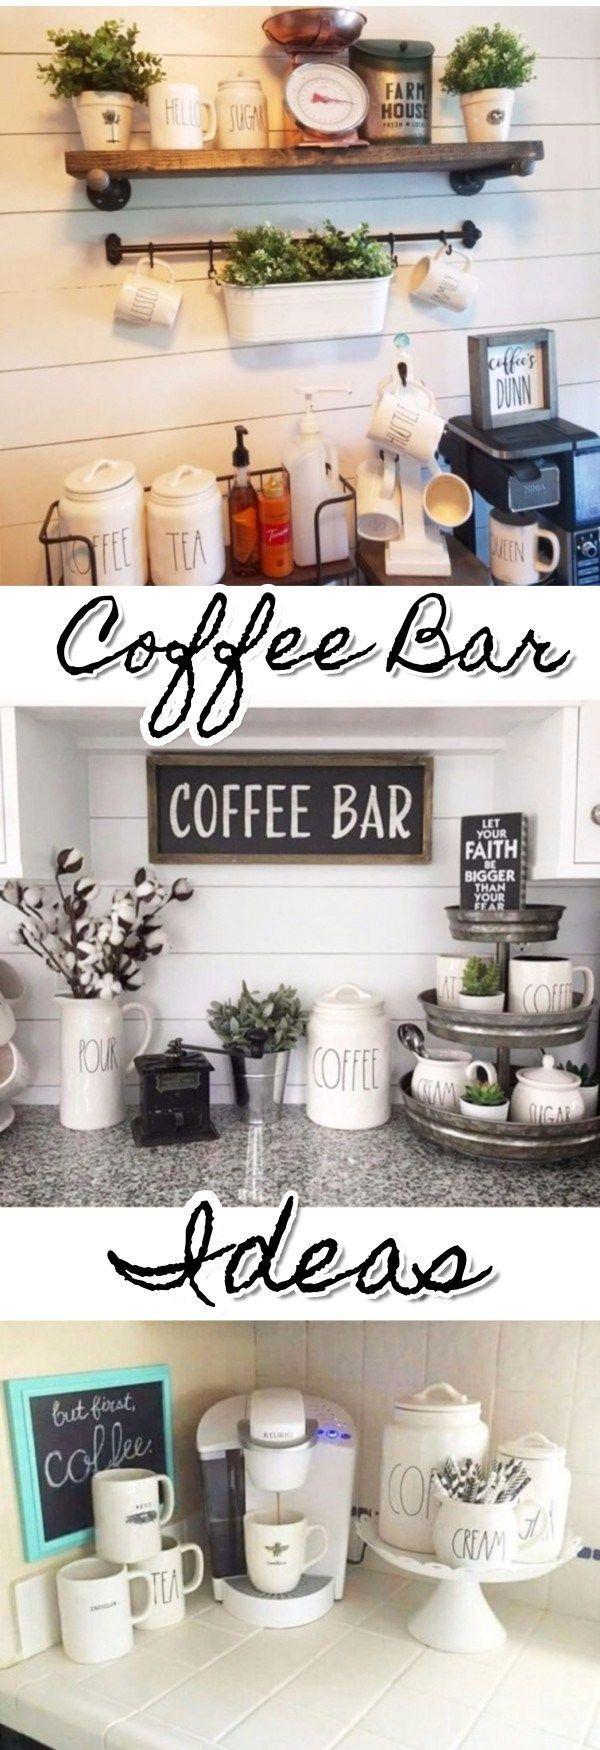 Diy coffee bar ideas stunning farmhouse style beverage for Kitchen corner bar ideas